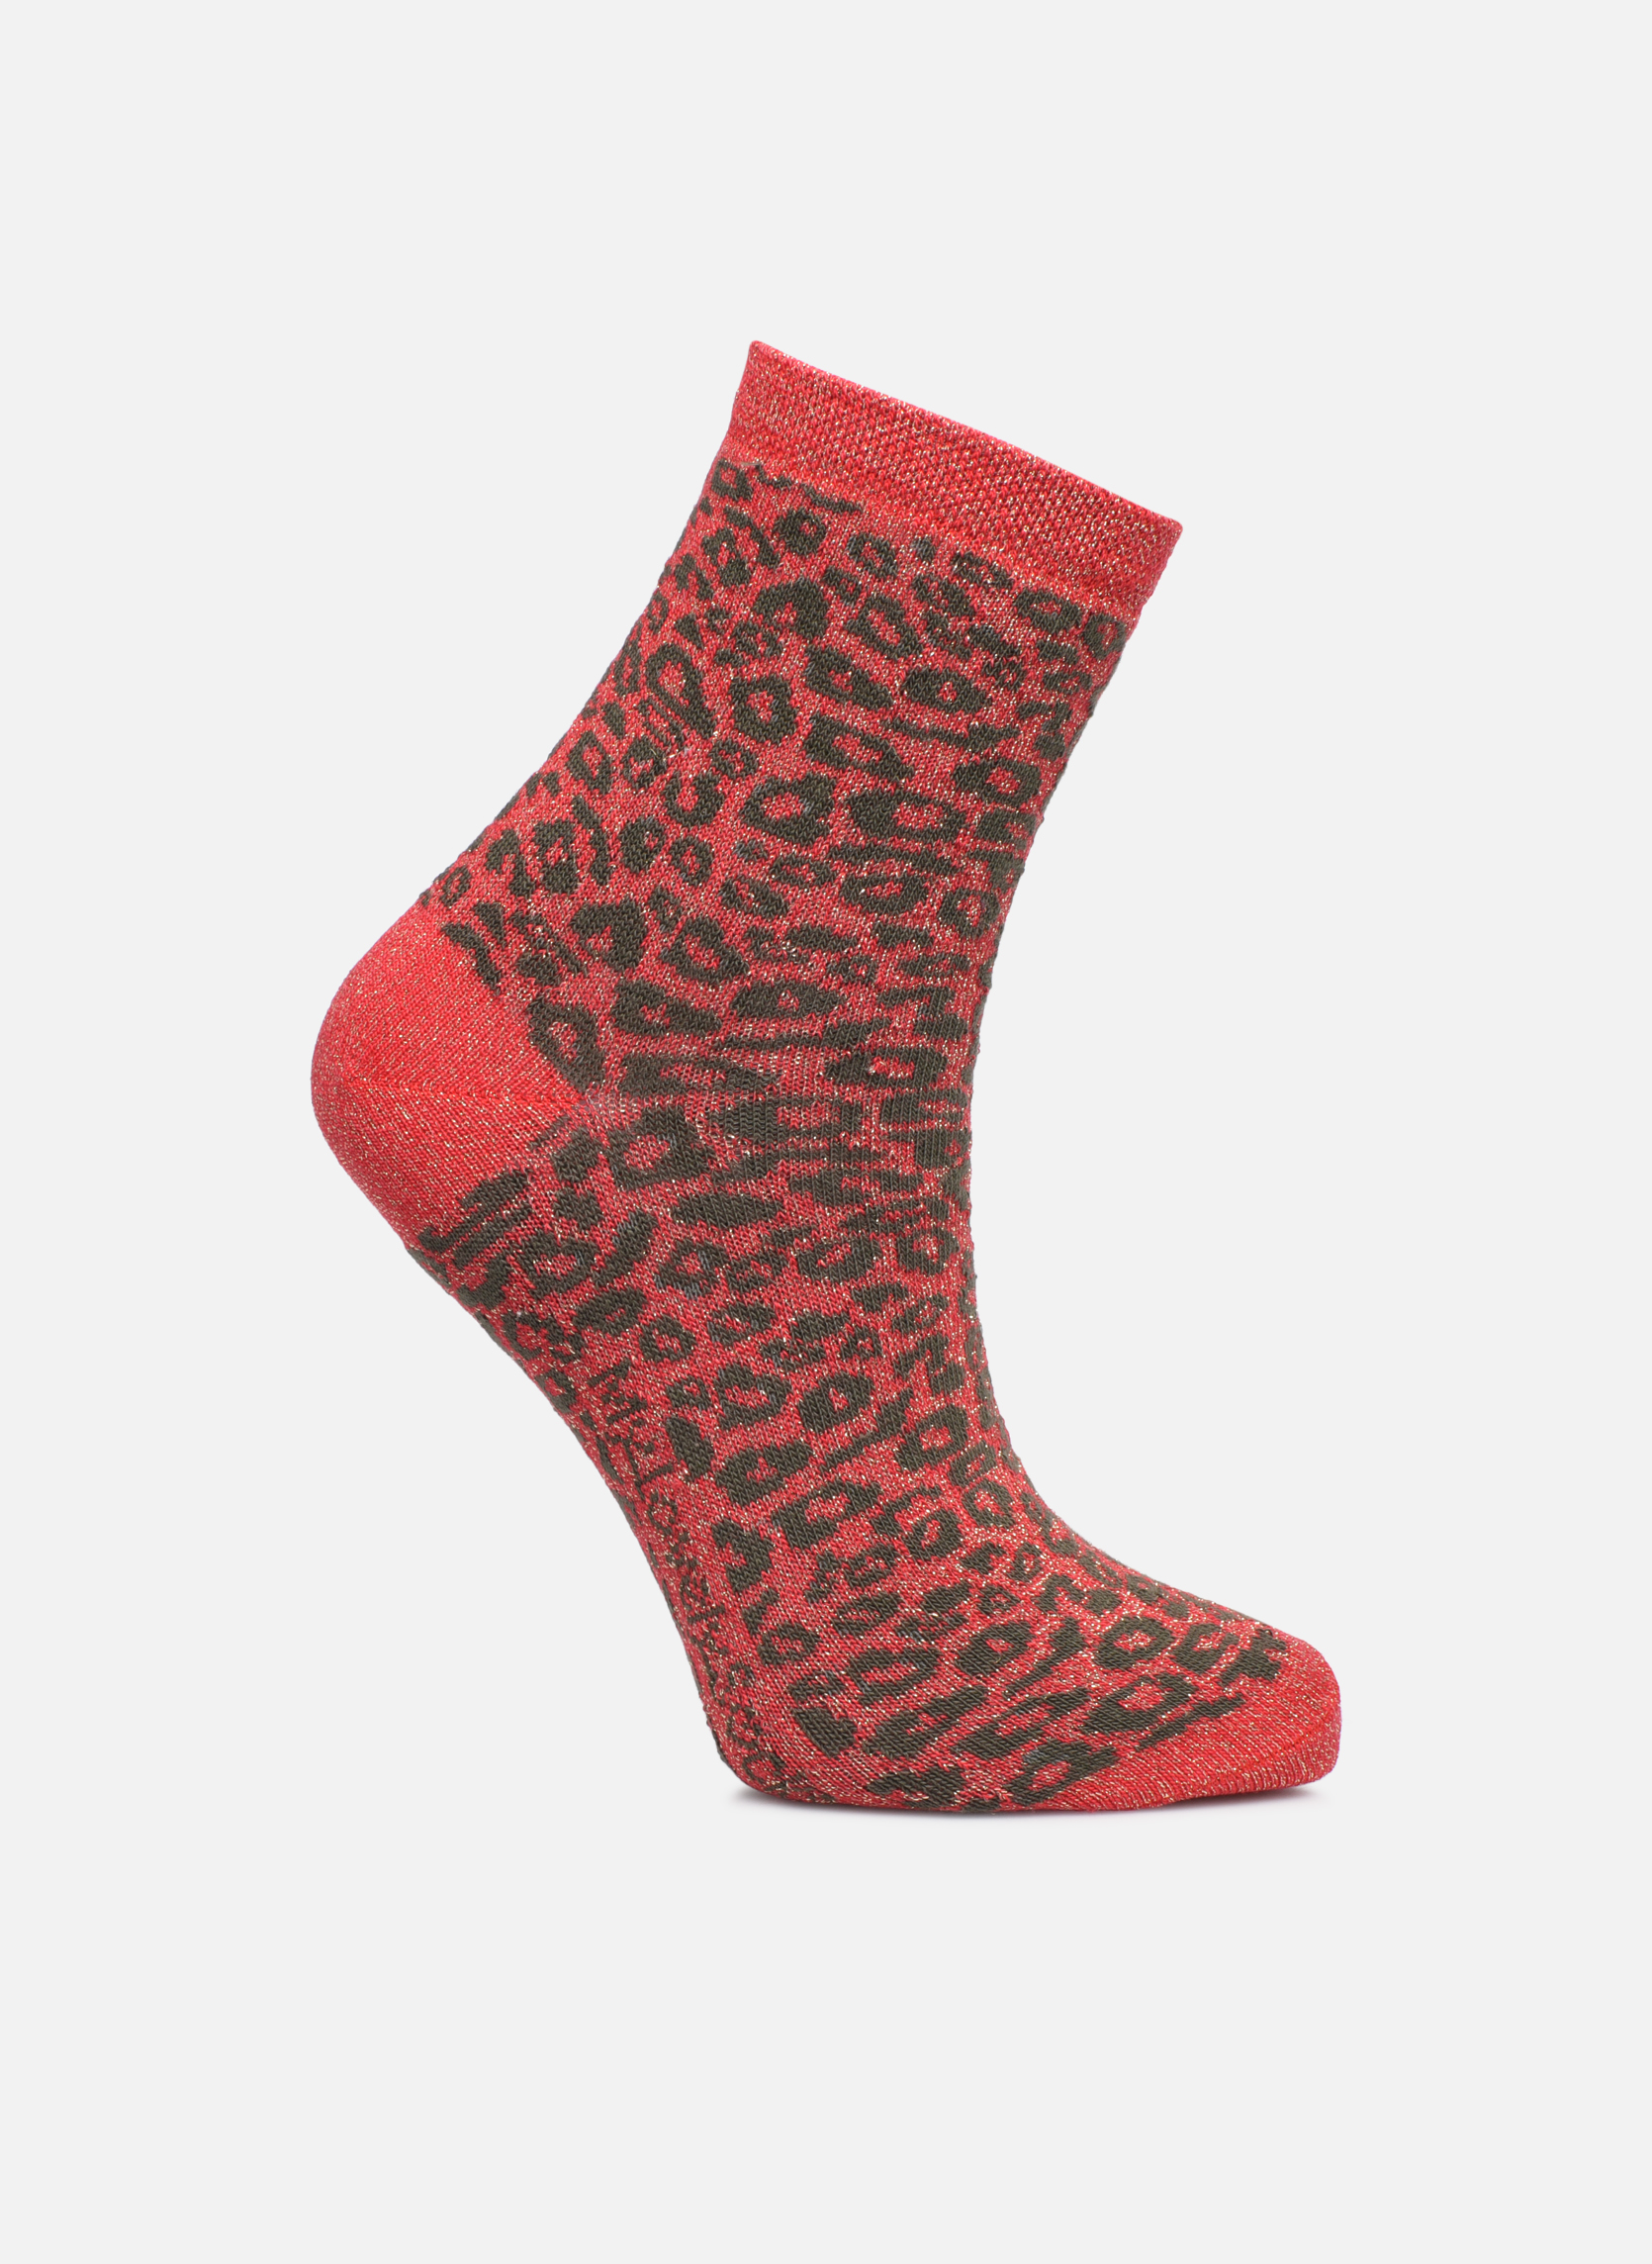 Socks & tights Accessories rose